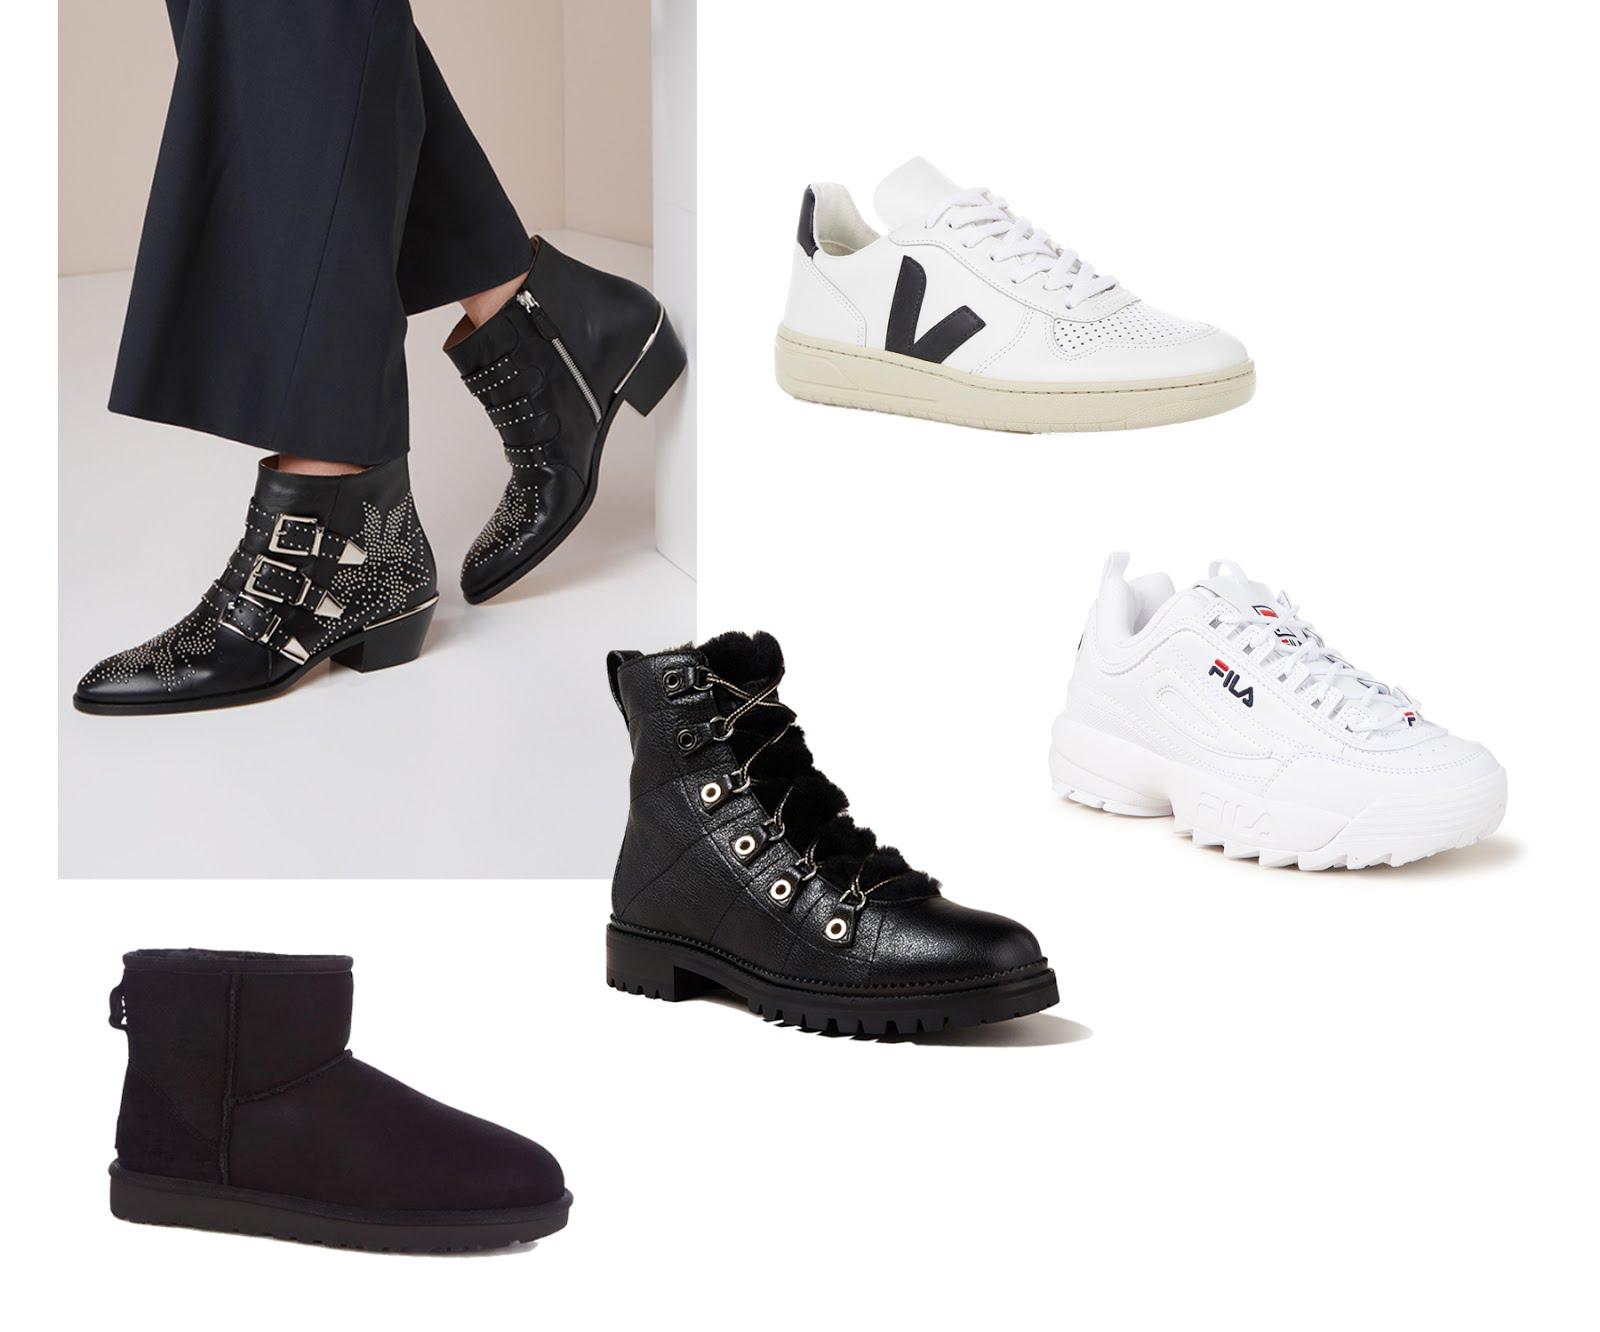 Chloe susanna boots, western boots, biker boots, winter boots, veja sneakers, sustainable, bijenkorf, fila disruptor, ugg mini, hiker boots, inpiration, 2018,